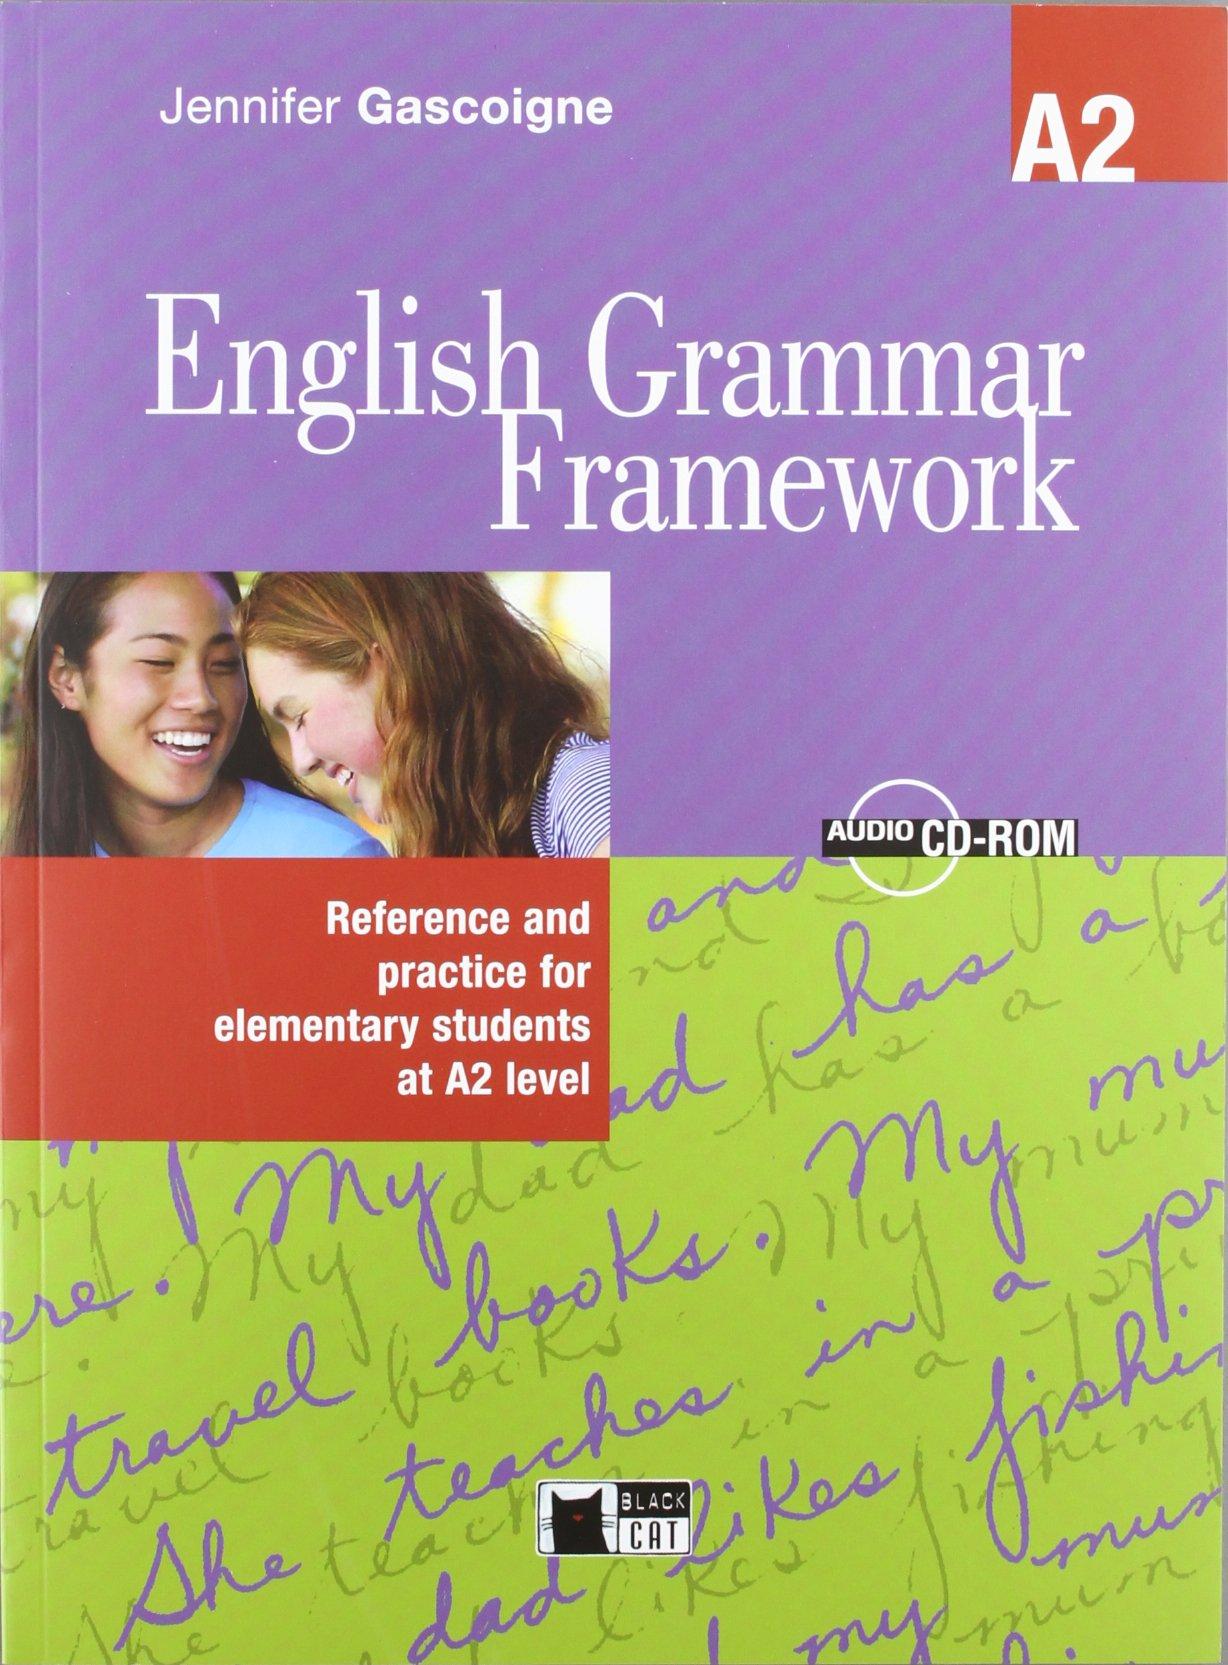 Eng Grammar Framework A1-A2 +R vocabulario elemental a1 a2 2cd